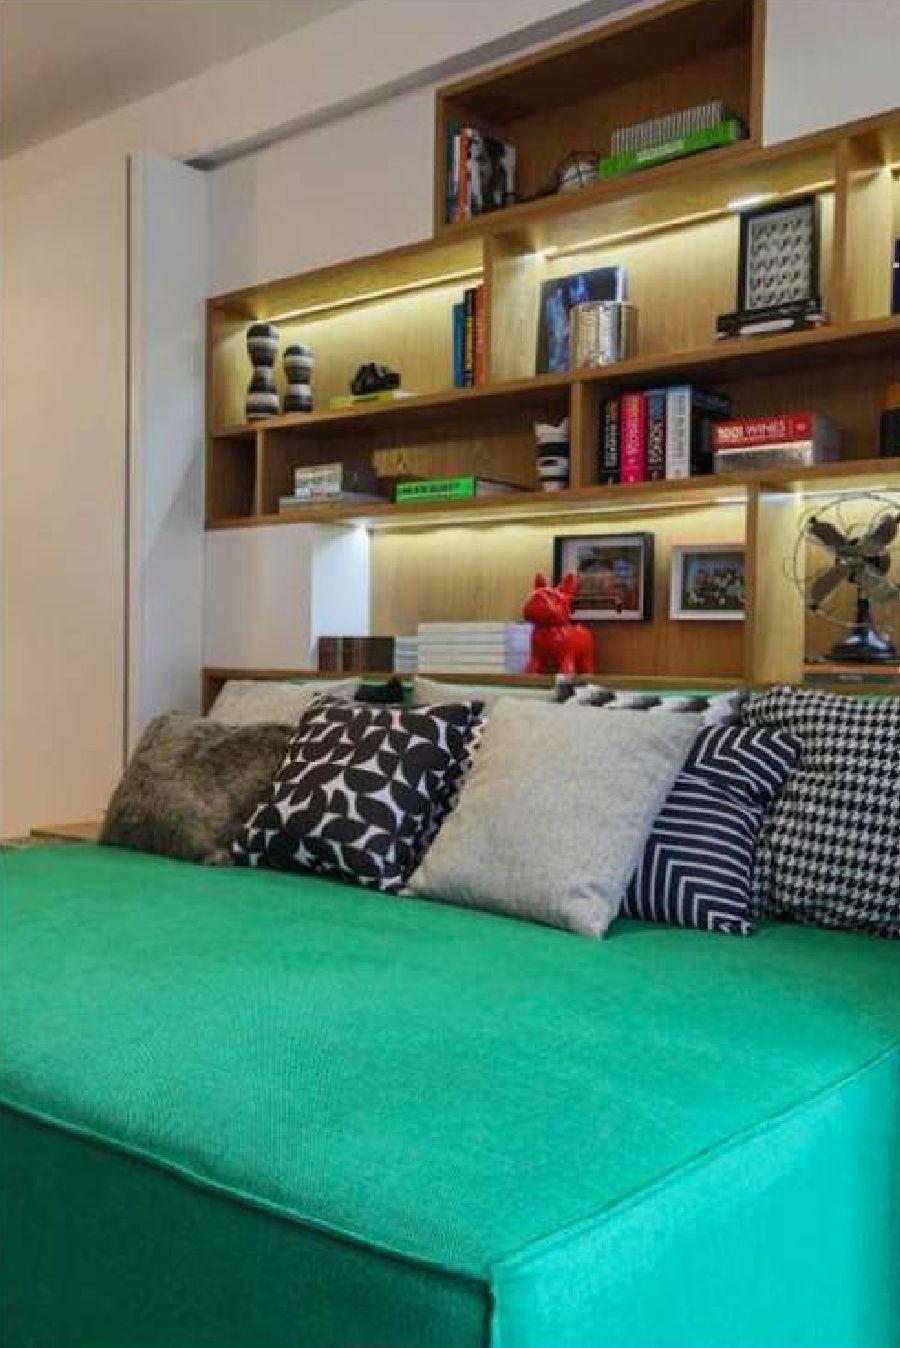 adelaparvu.com despre pat in living, design interior Fernanda Marques (4)